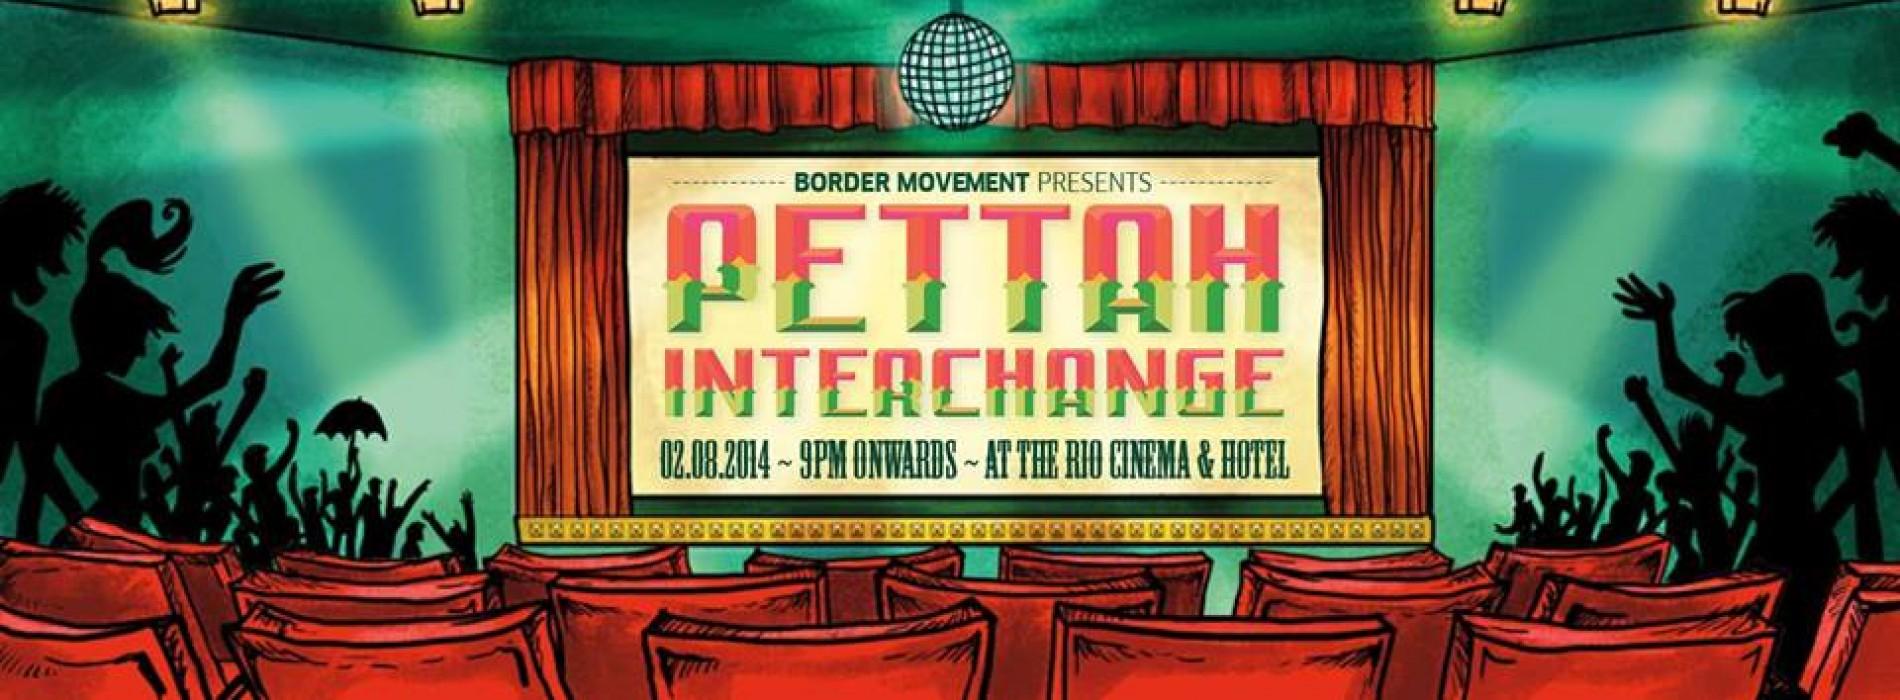 Dj Shiyam: The Pettah Interchange Set